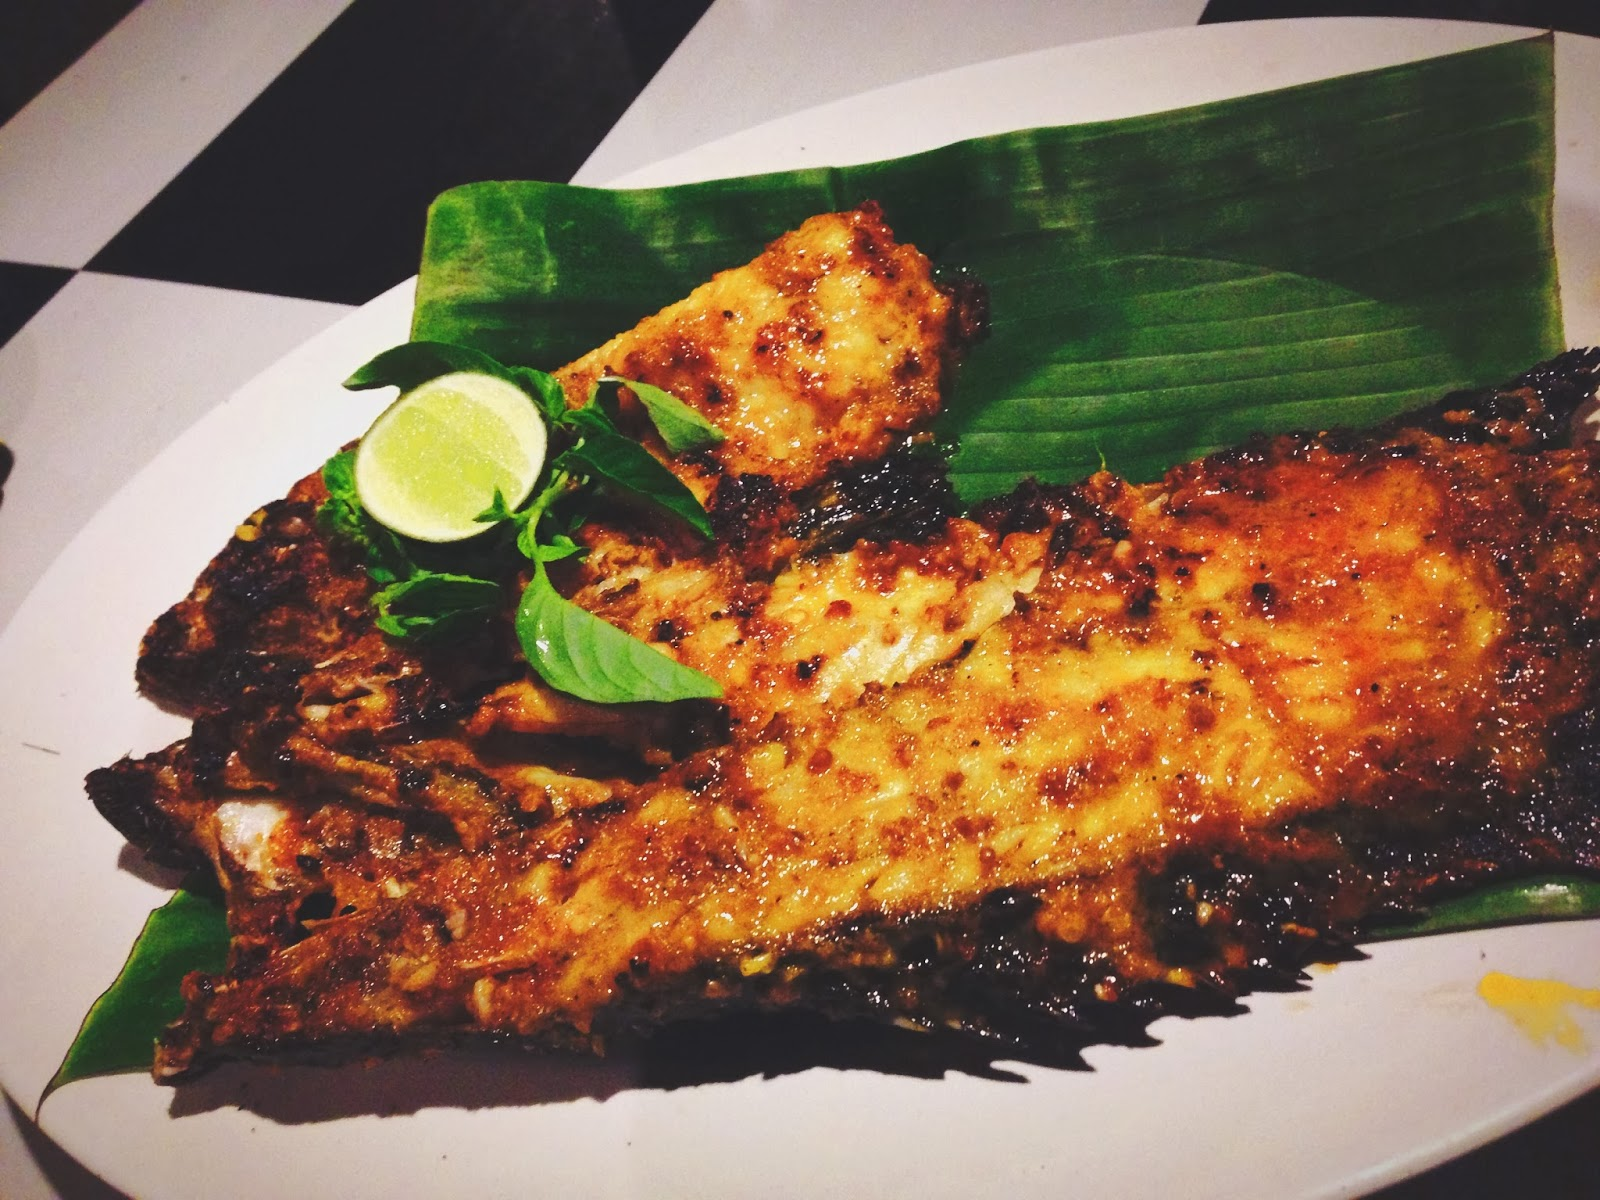 KUMORY: Yogyakarta - Ikan Bakar Jimbaran: A Review